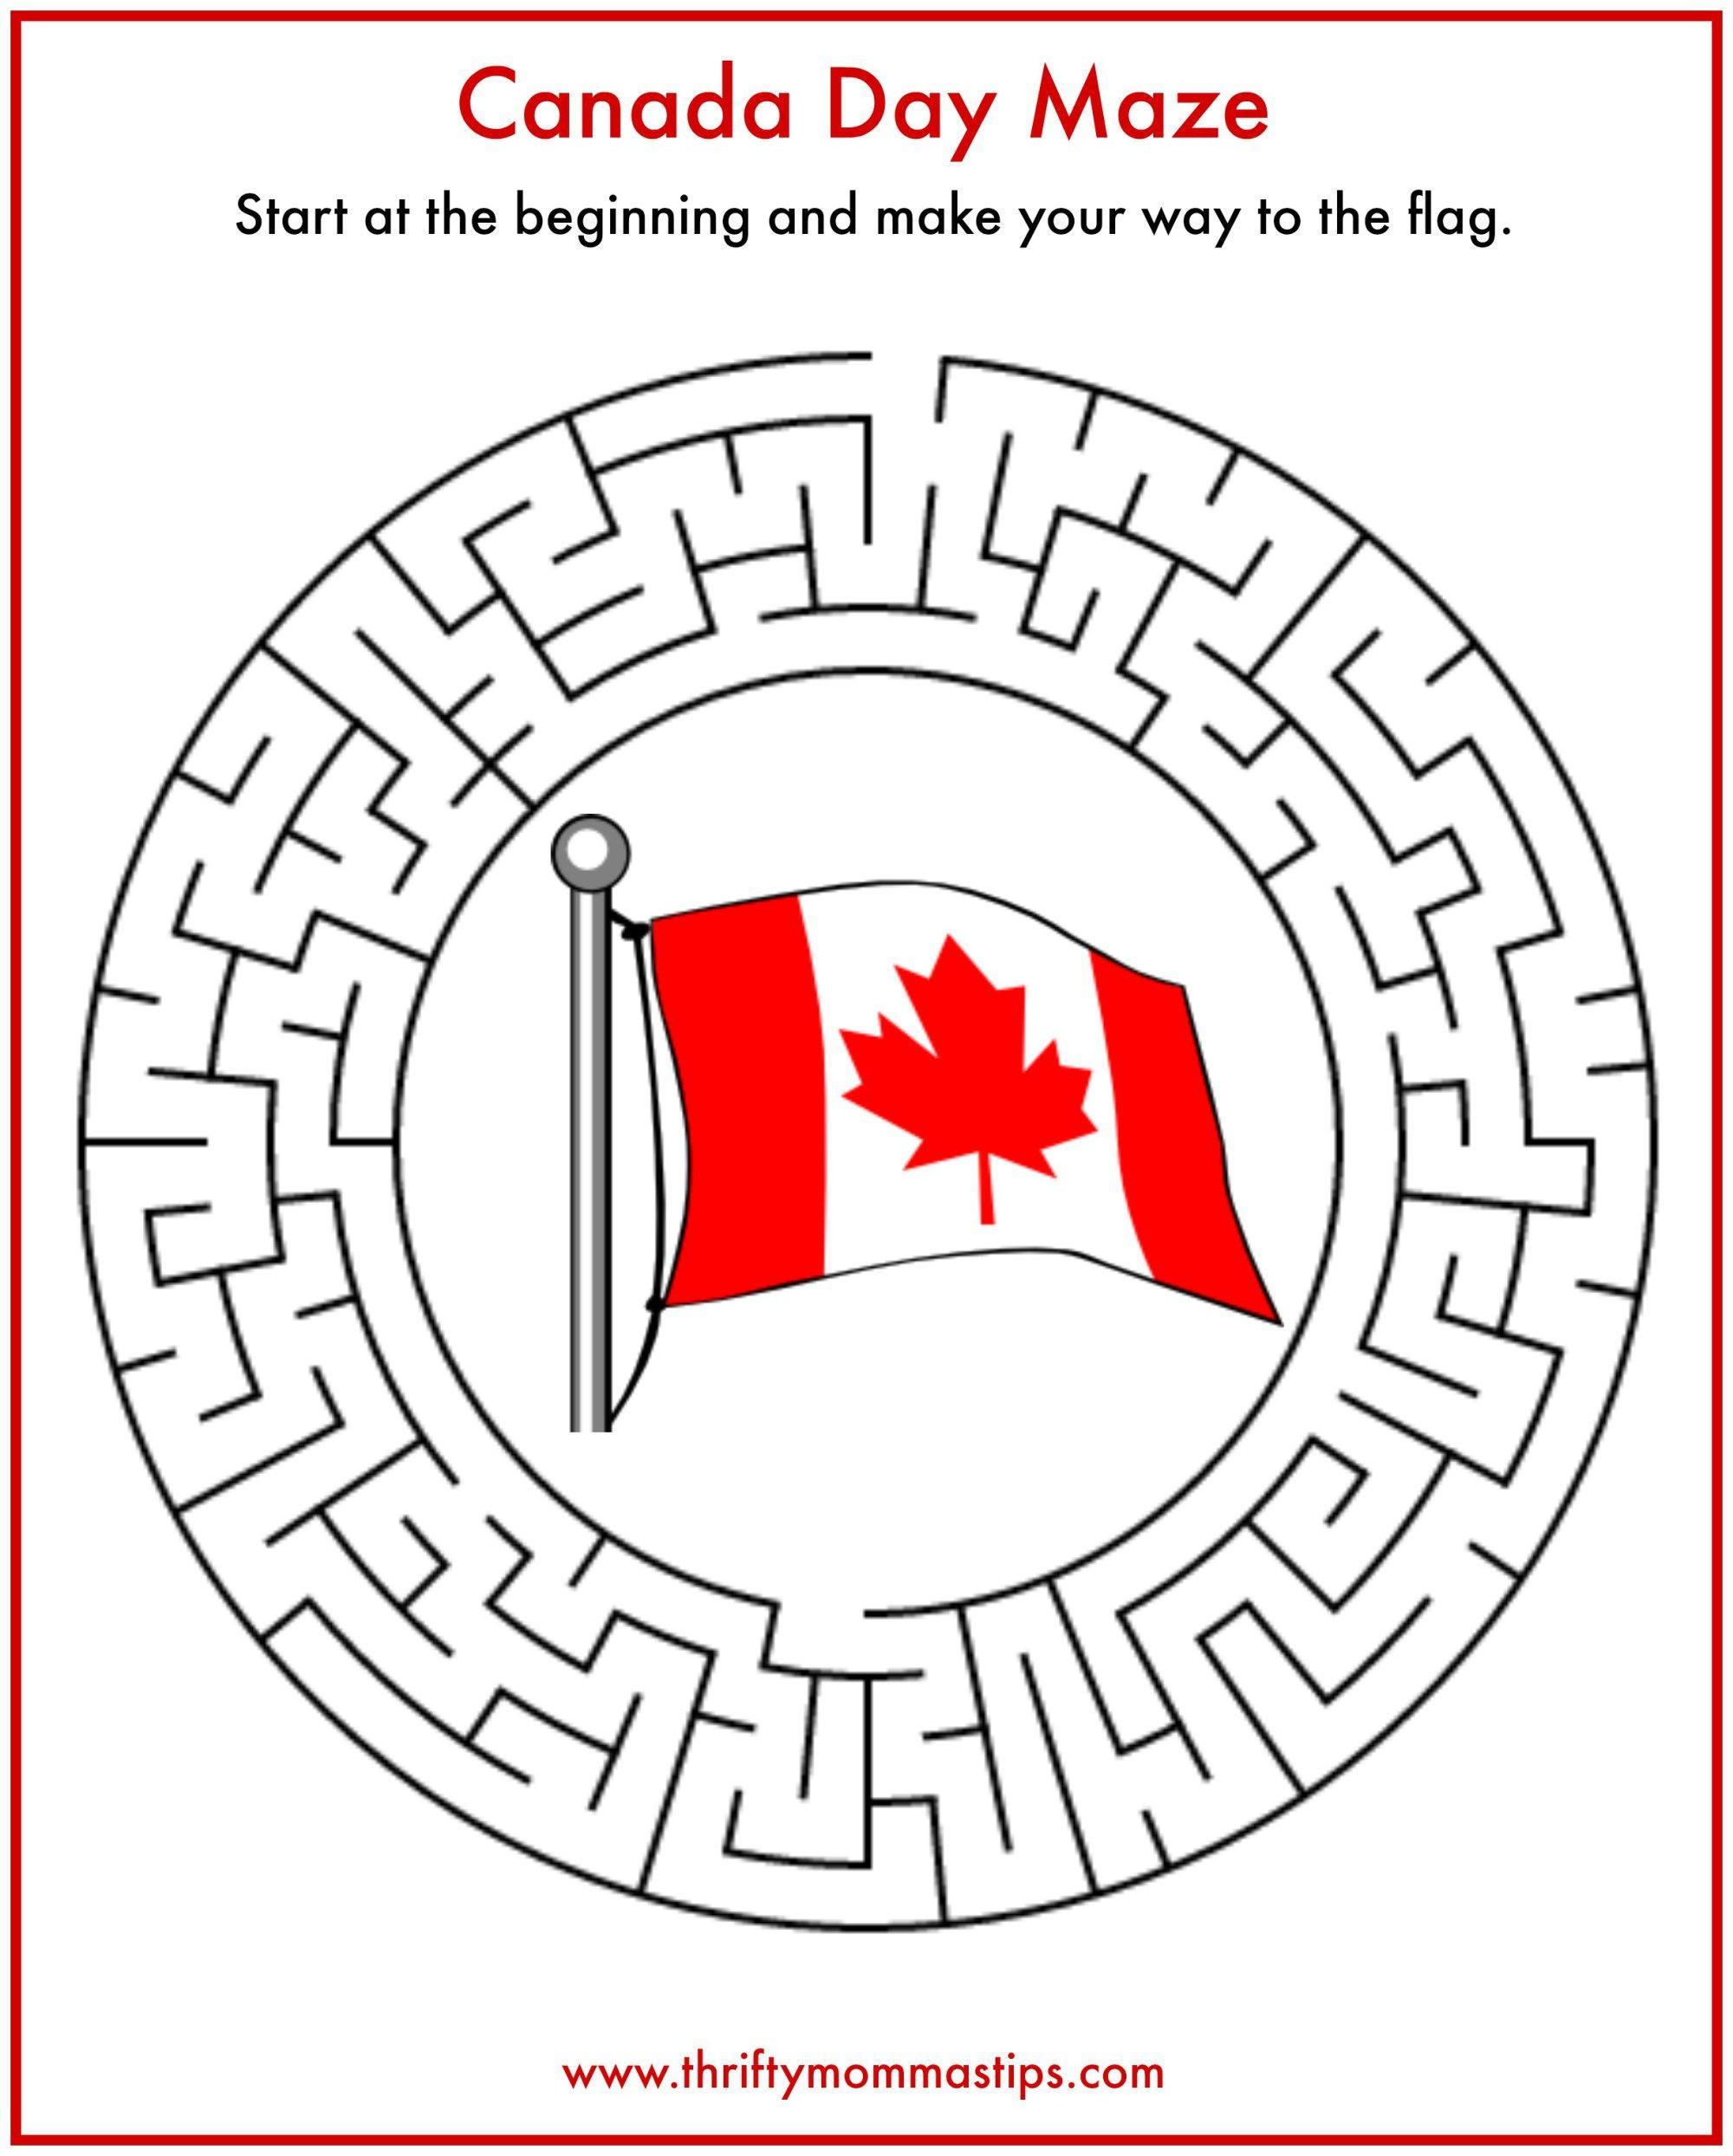 Fun Easy Canada Day Maze